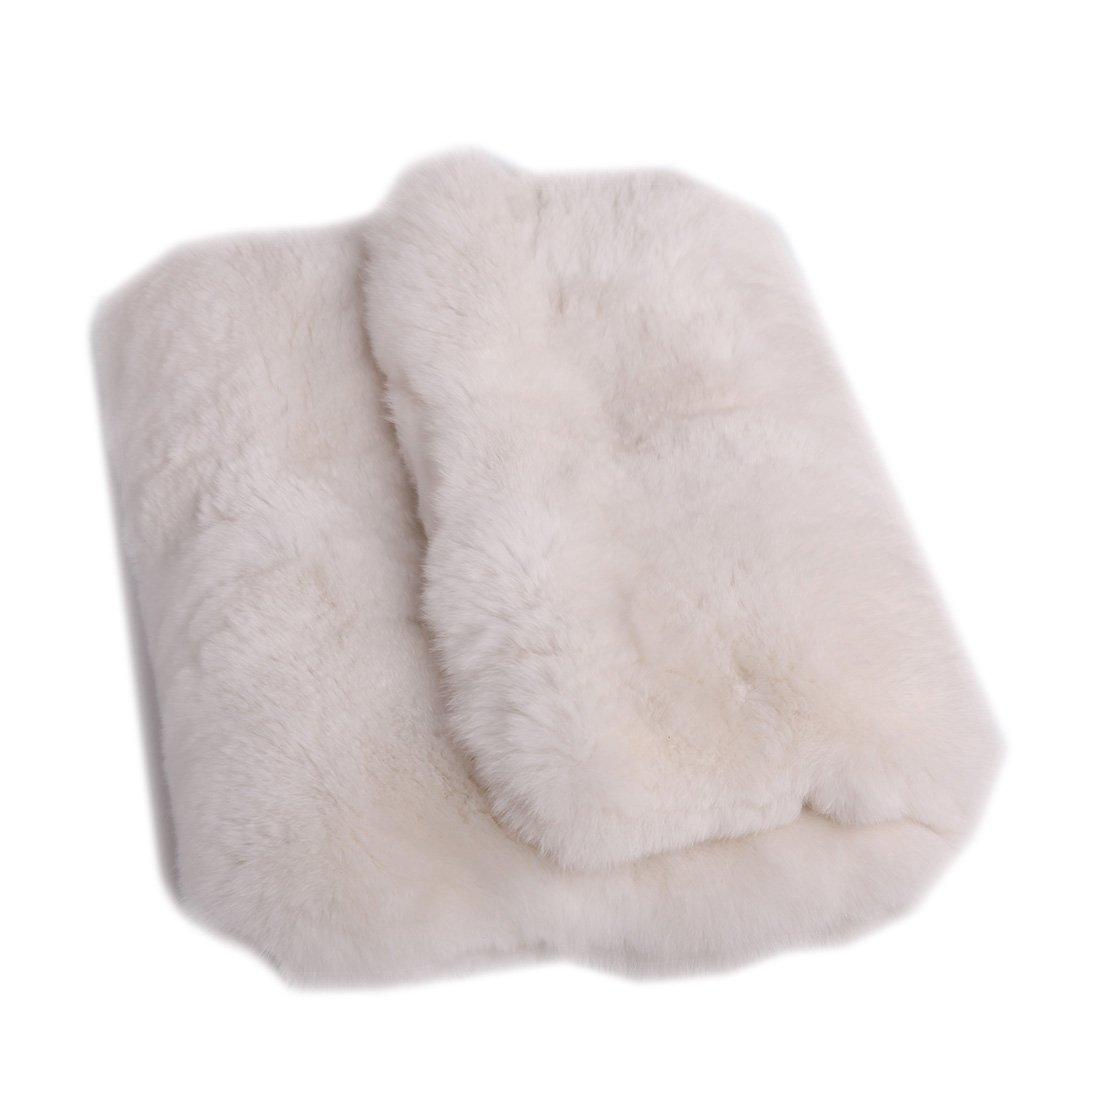 URSFUR Women's Rex Rabbit Fur Envelope Clutch Handbag Evening Party Bag Purse by URSFUR